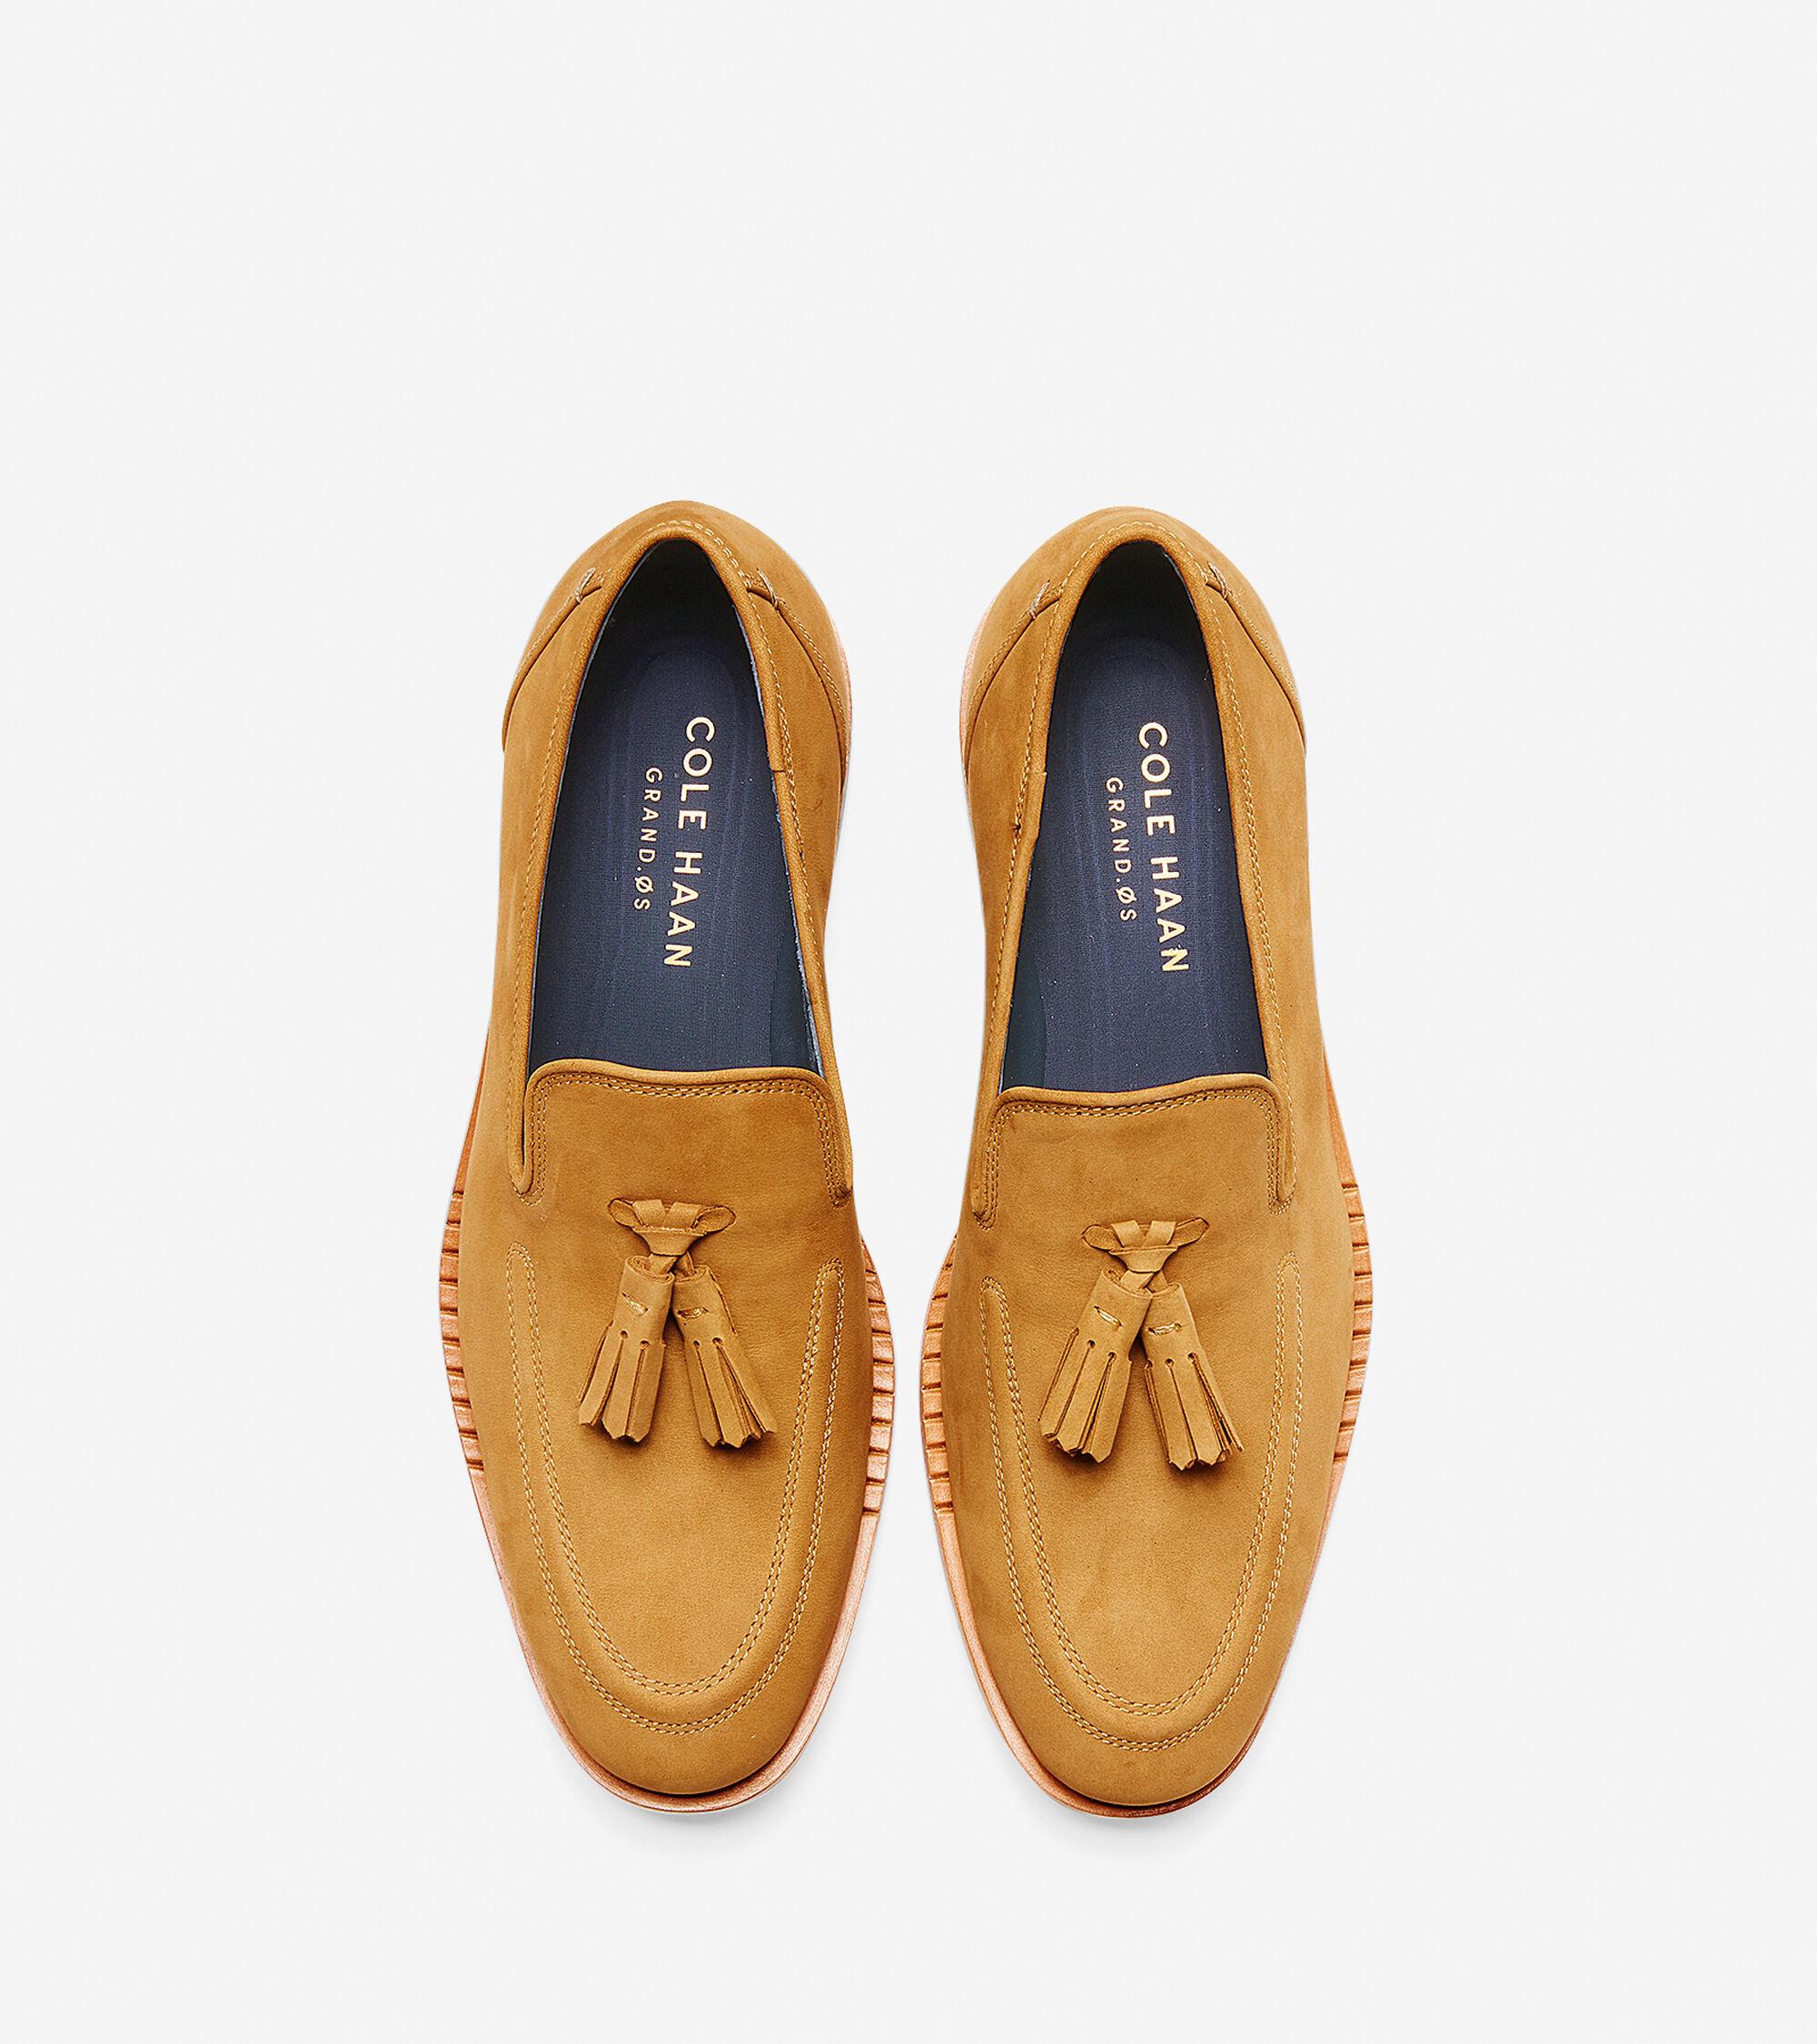 68bb3db67e8 ... Washington Grand Tassel Loafer  Washington Grand Tassel Loafer   Washington Grand Tassel Loafer.  COLEHAAN